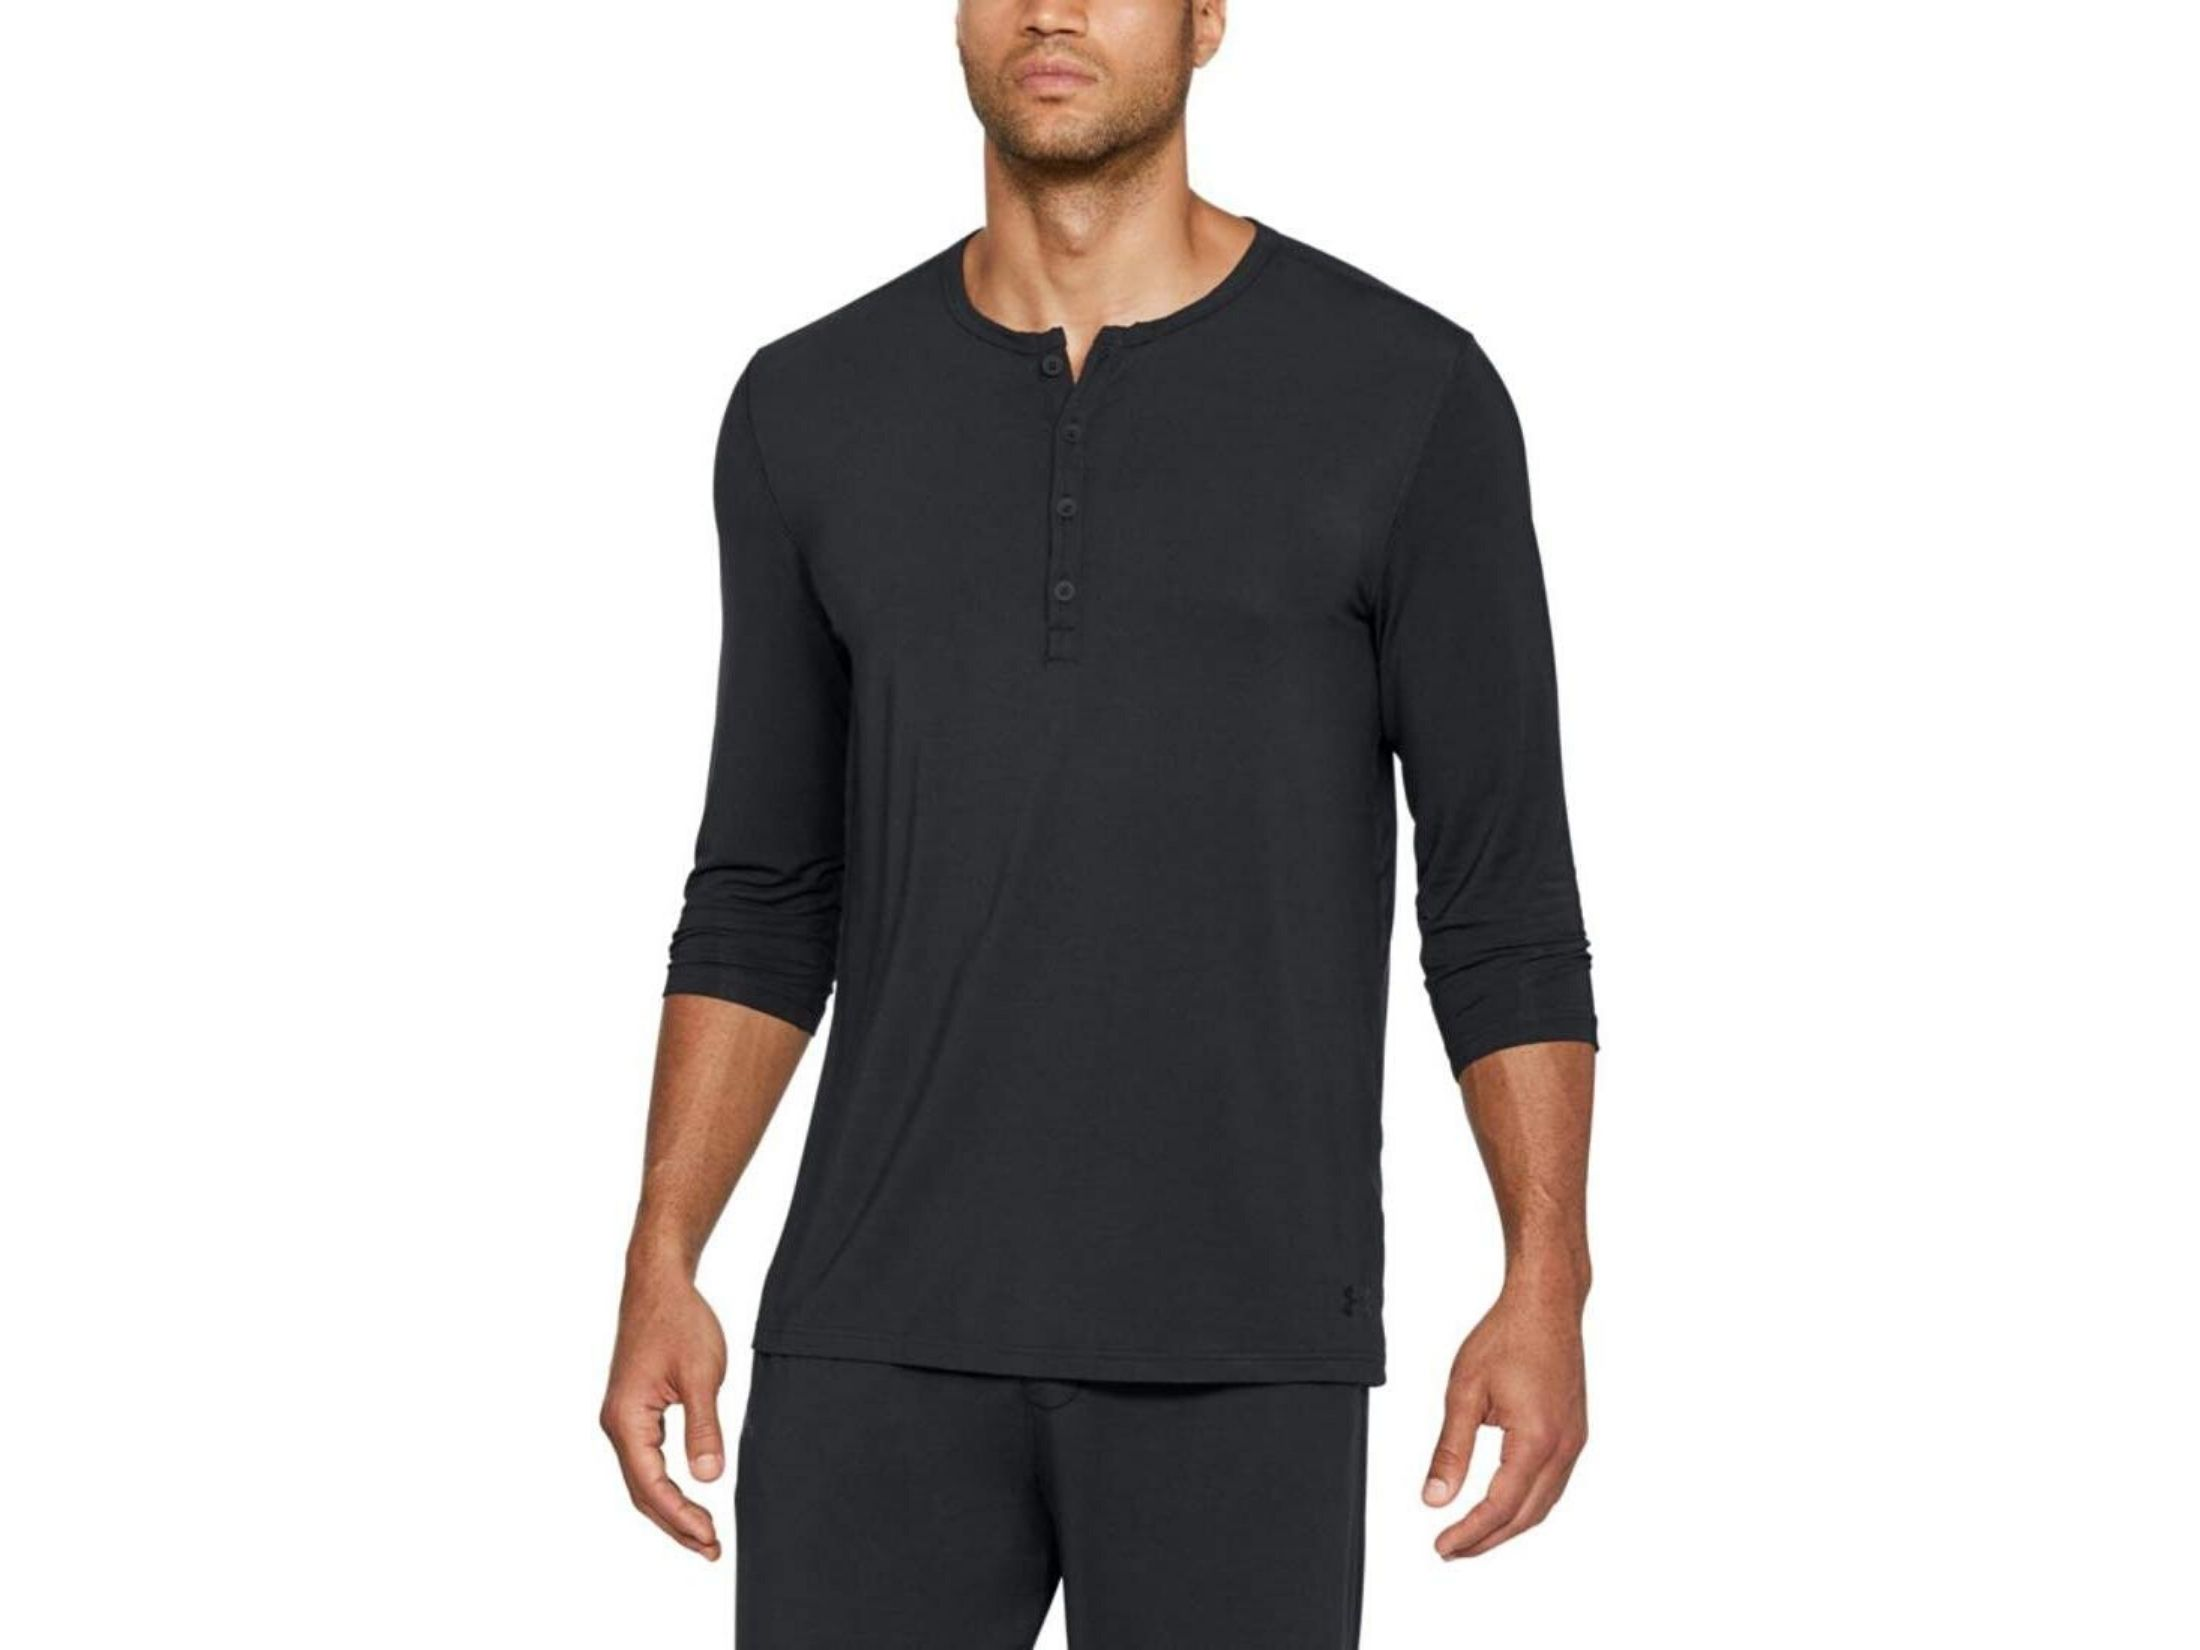 UA Recover Ultra Comfort Sleepwear